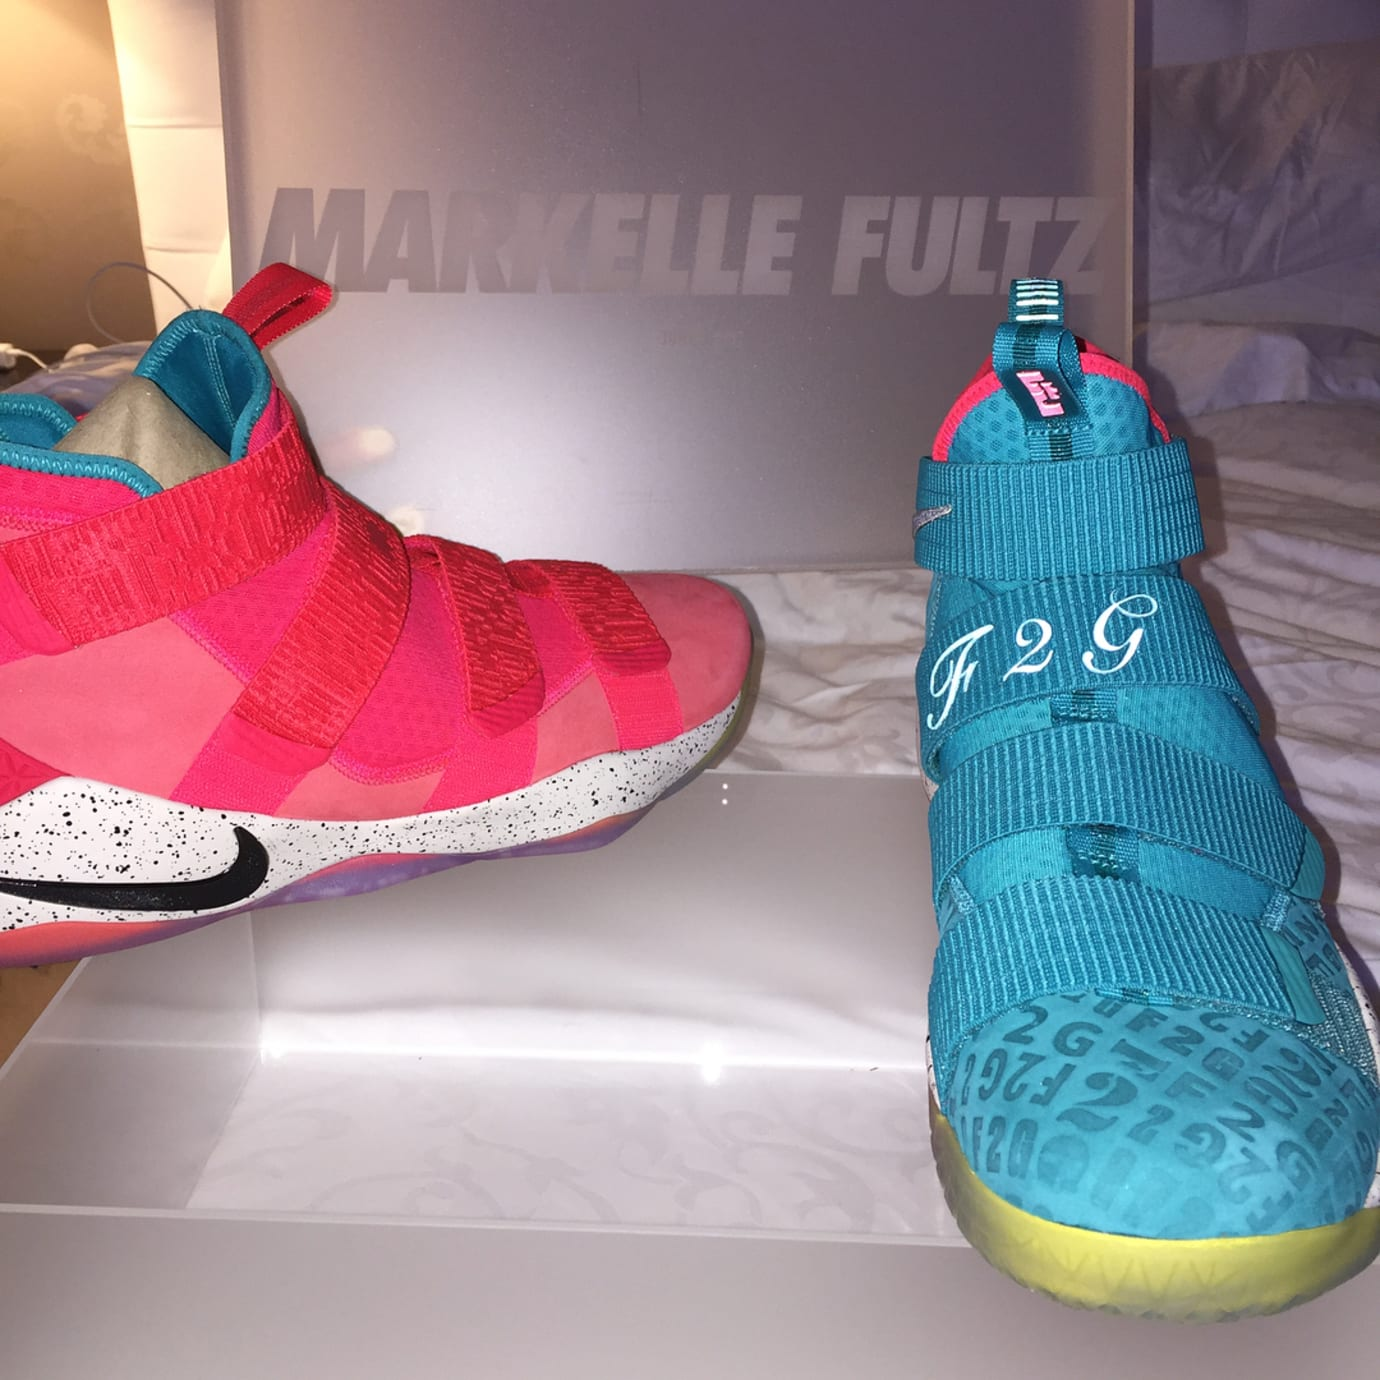 18221ead348fe Markelle Fultz Nike LeBron Soldier 11 F2G PE (2)